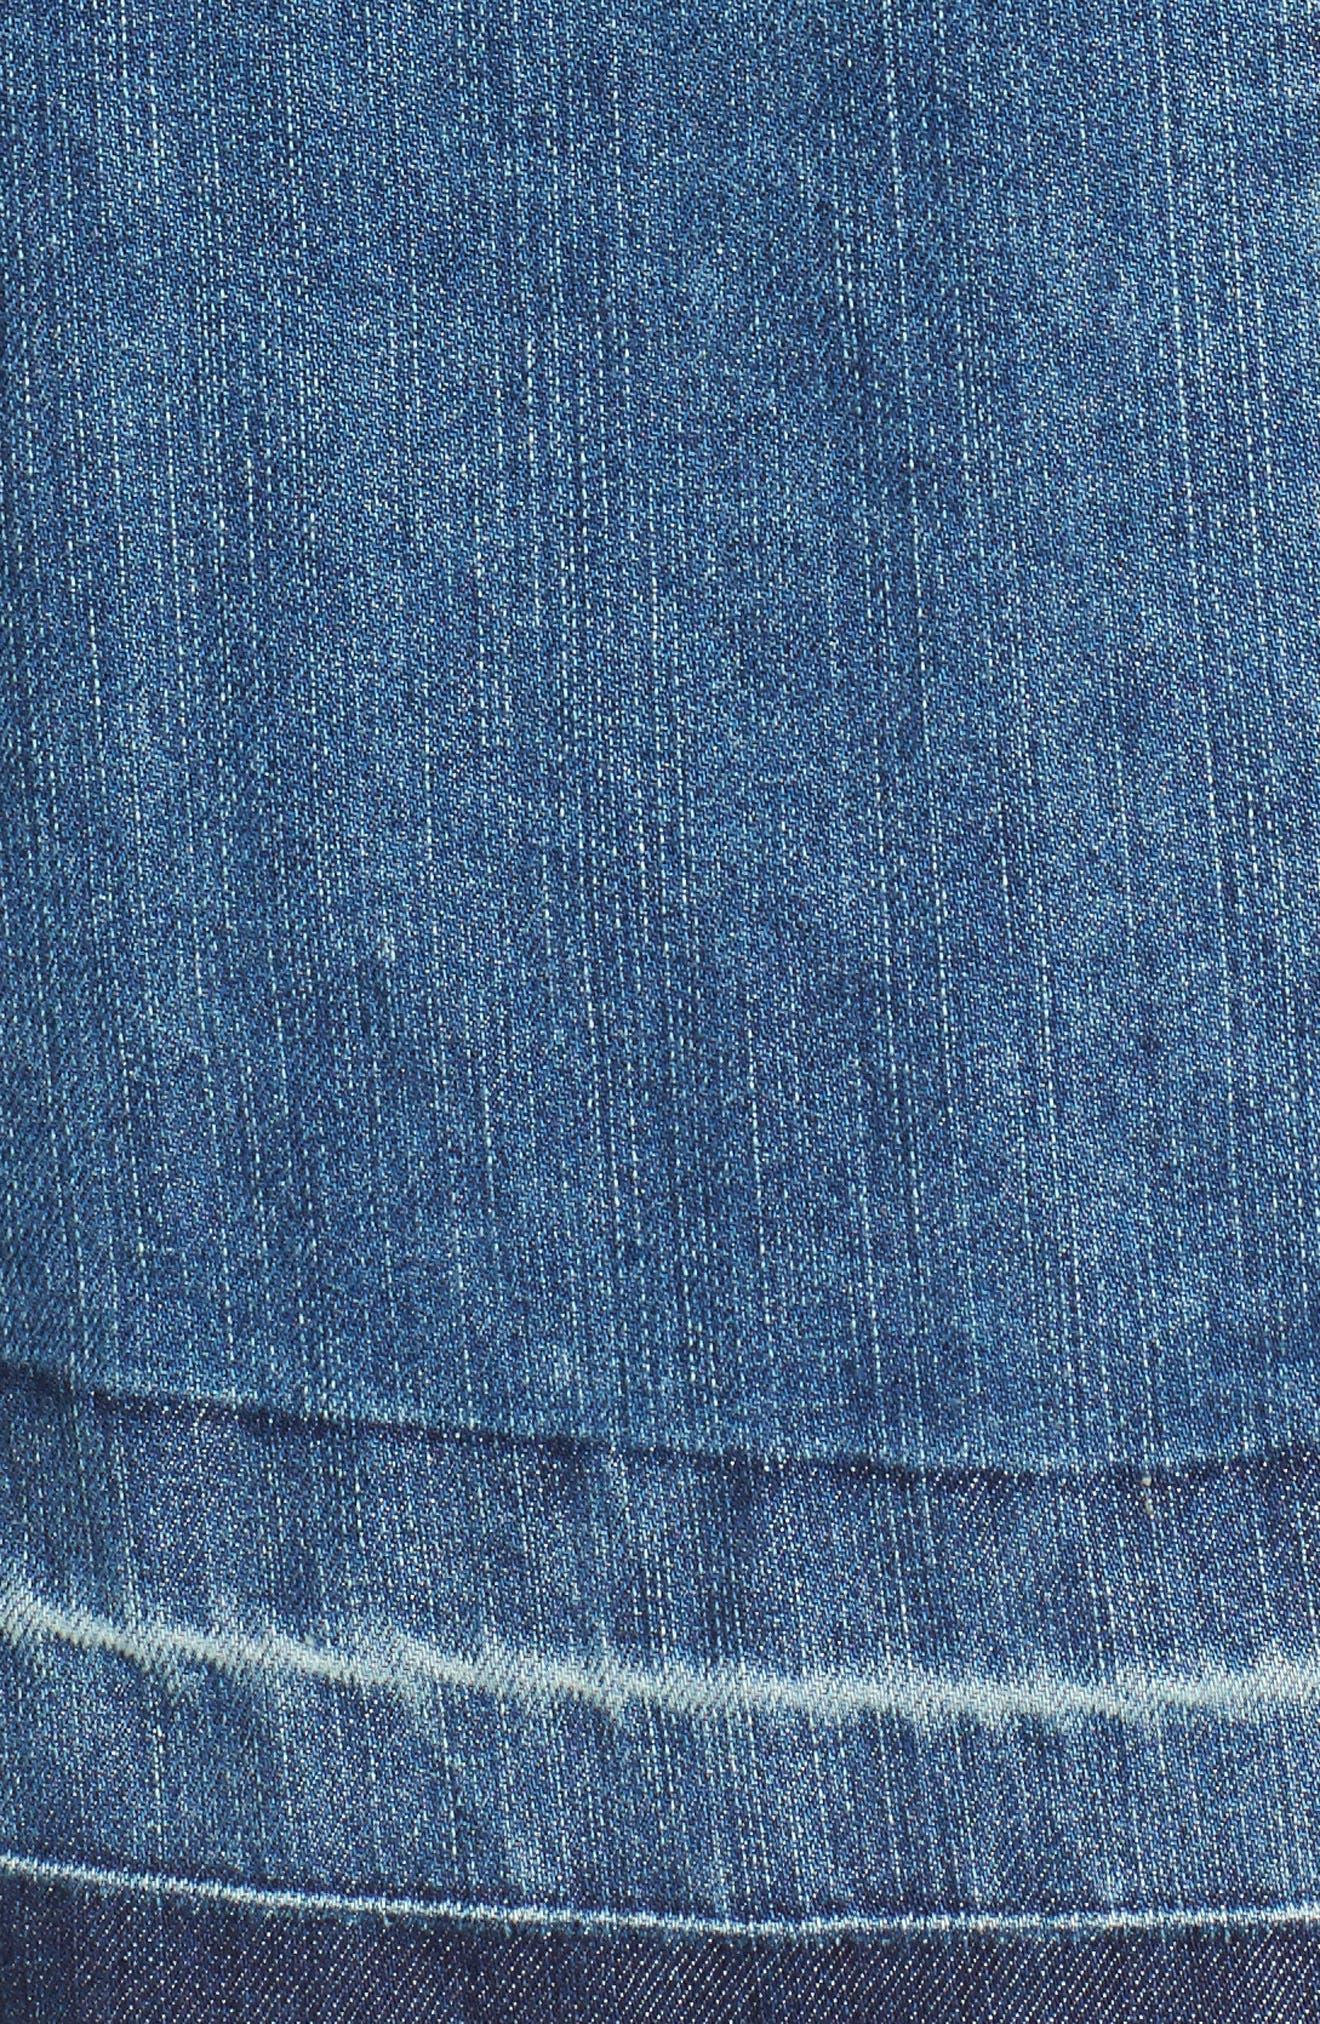 Release Hem Denim Jacket,                             Alternate thumbnail 5, color,                             Blue